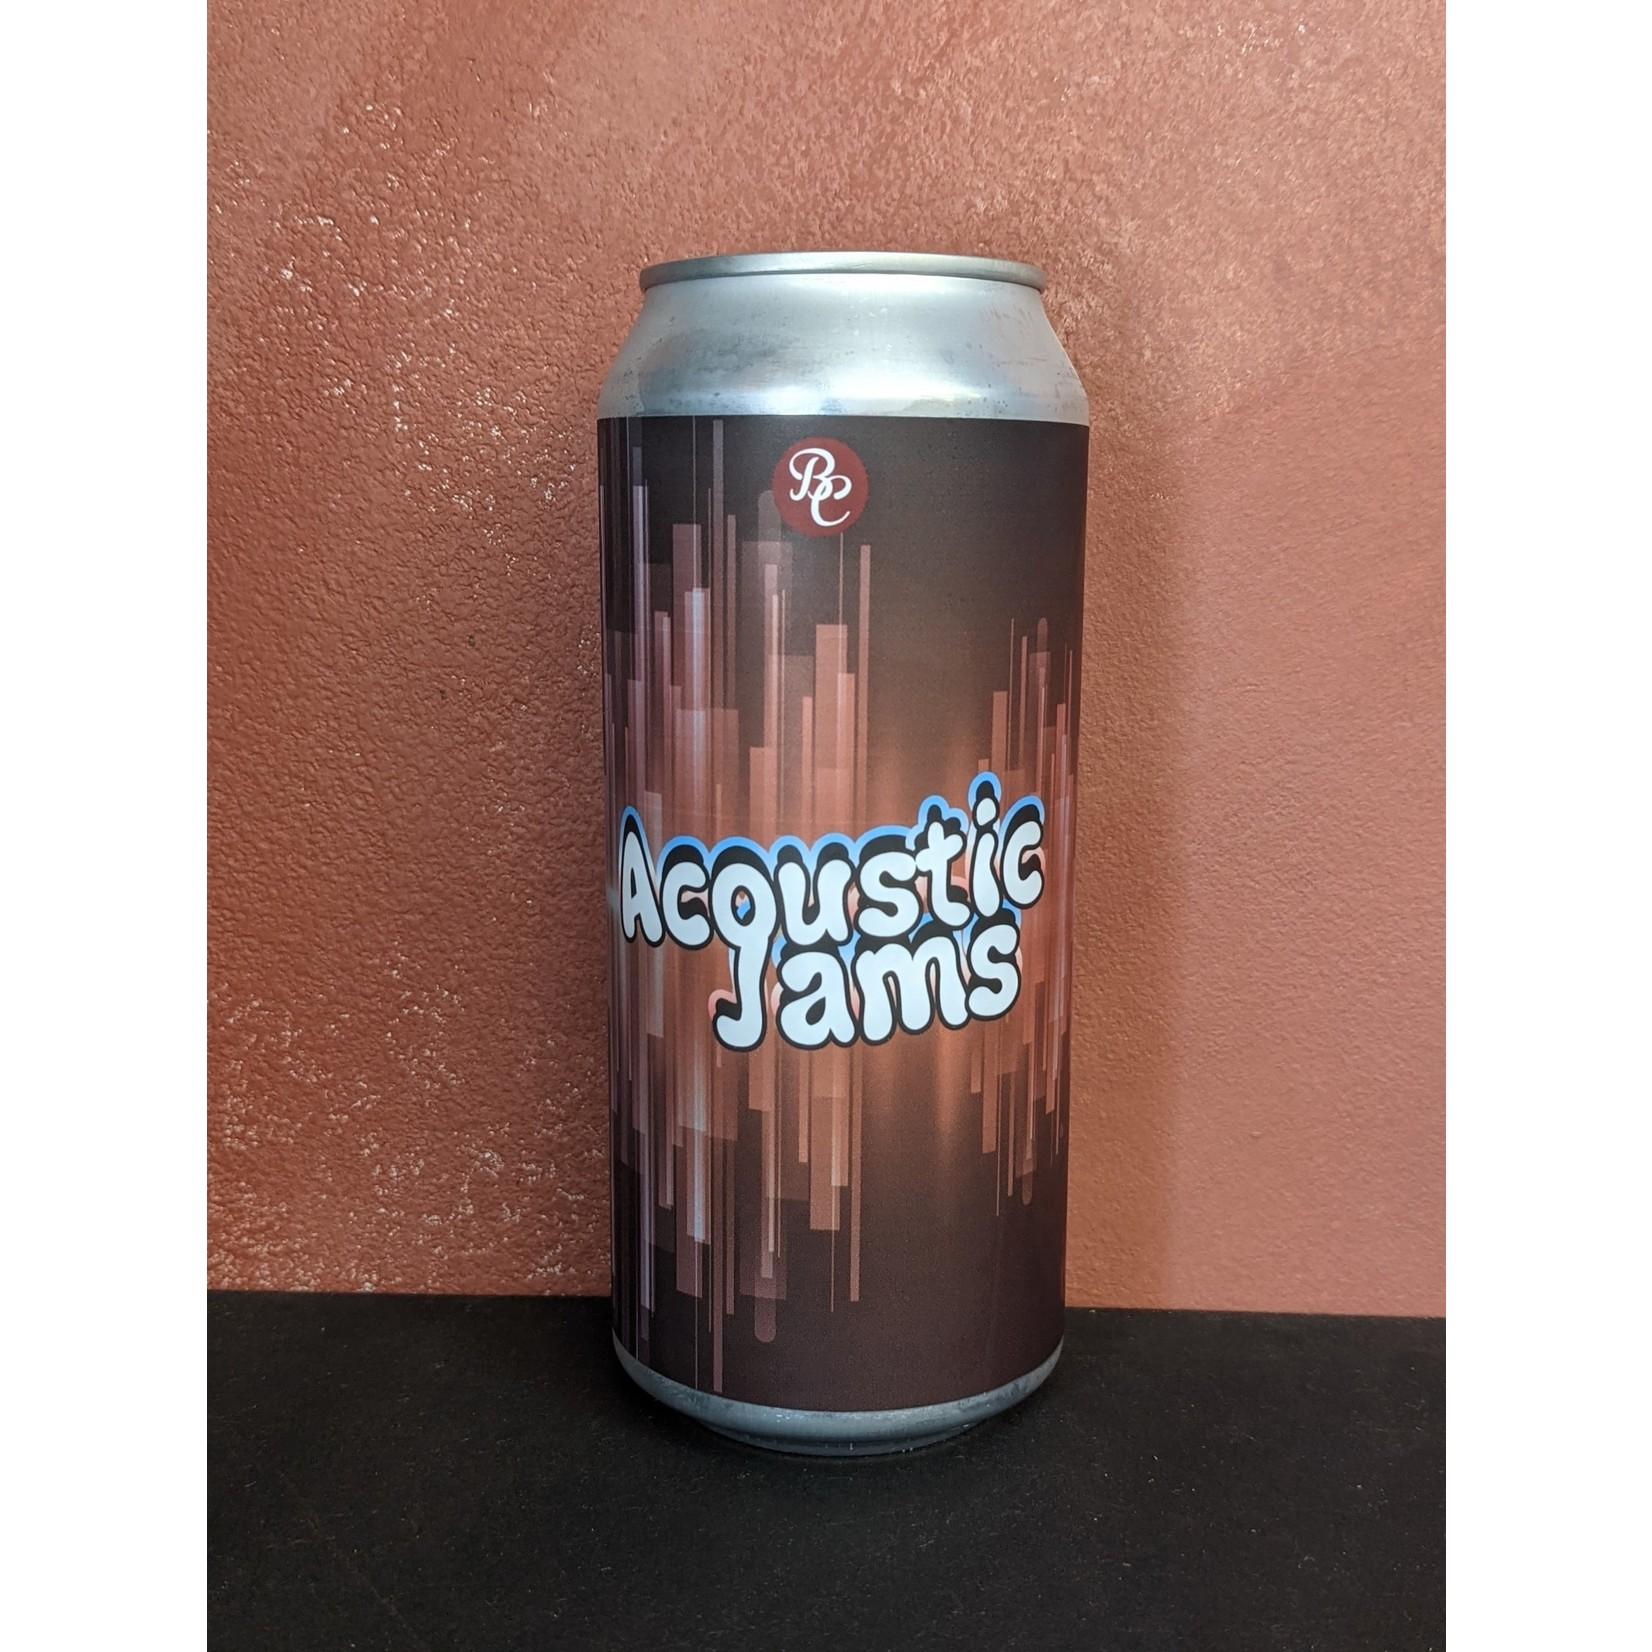 "Brix City ""Acoustic Jams"" DIPA"